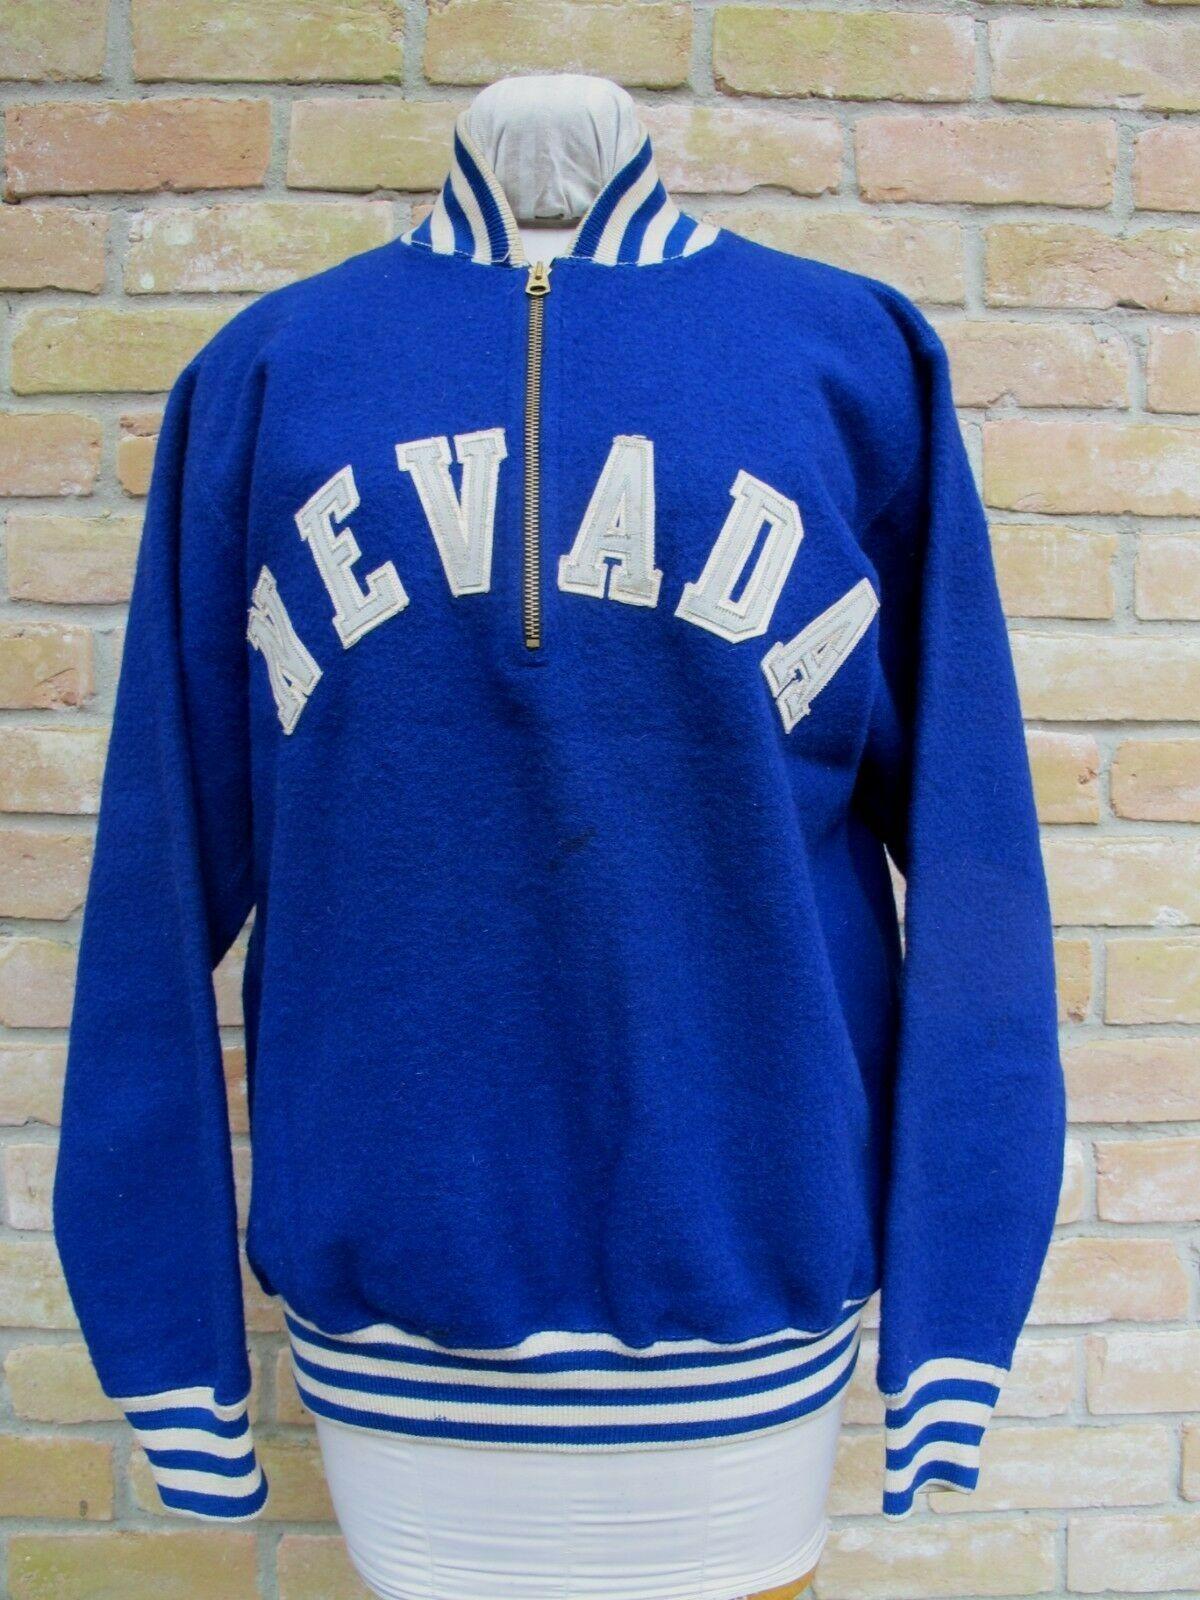 Vintage 50 S Mcgregor Goldsmith Sweatshirt Nevada Reno Wolf Pack Size 40 Good Ebay Sweatshirts Vintage Outfits Clothes